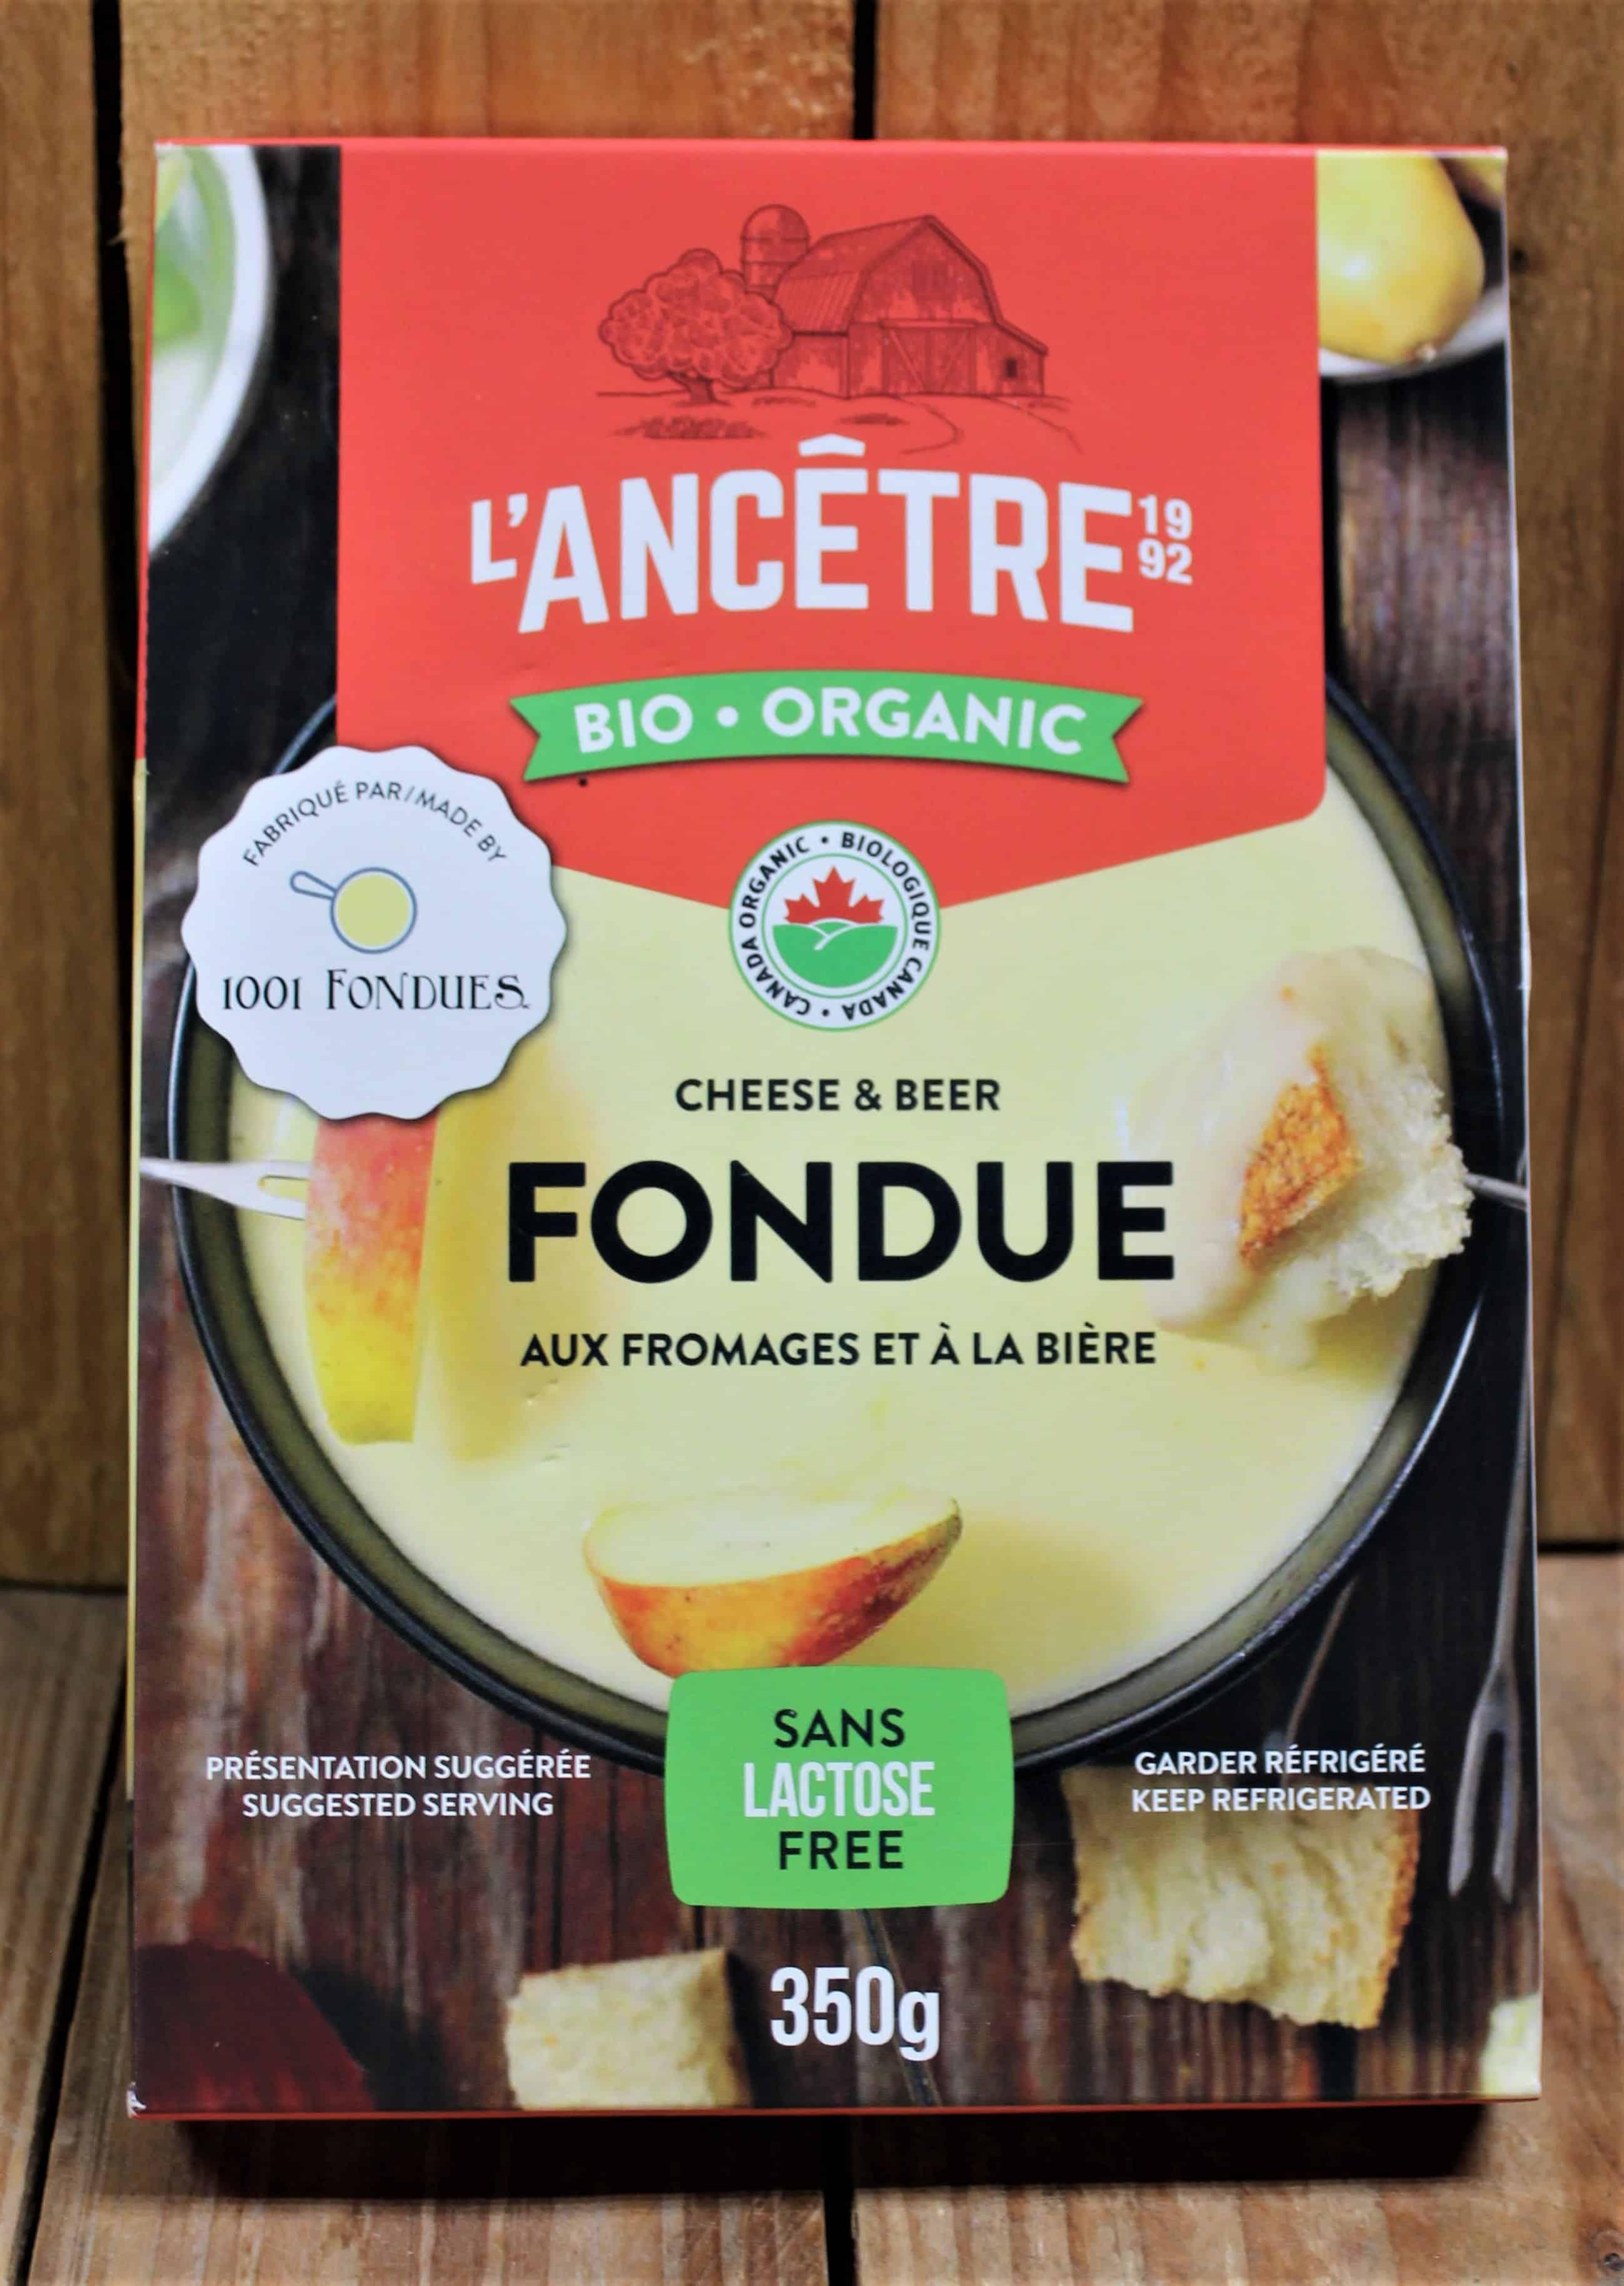 L'Ancetre – Organic Fondue, cheese & beer (350g)